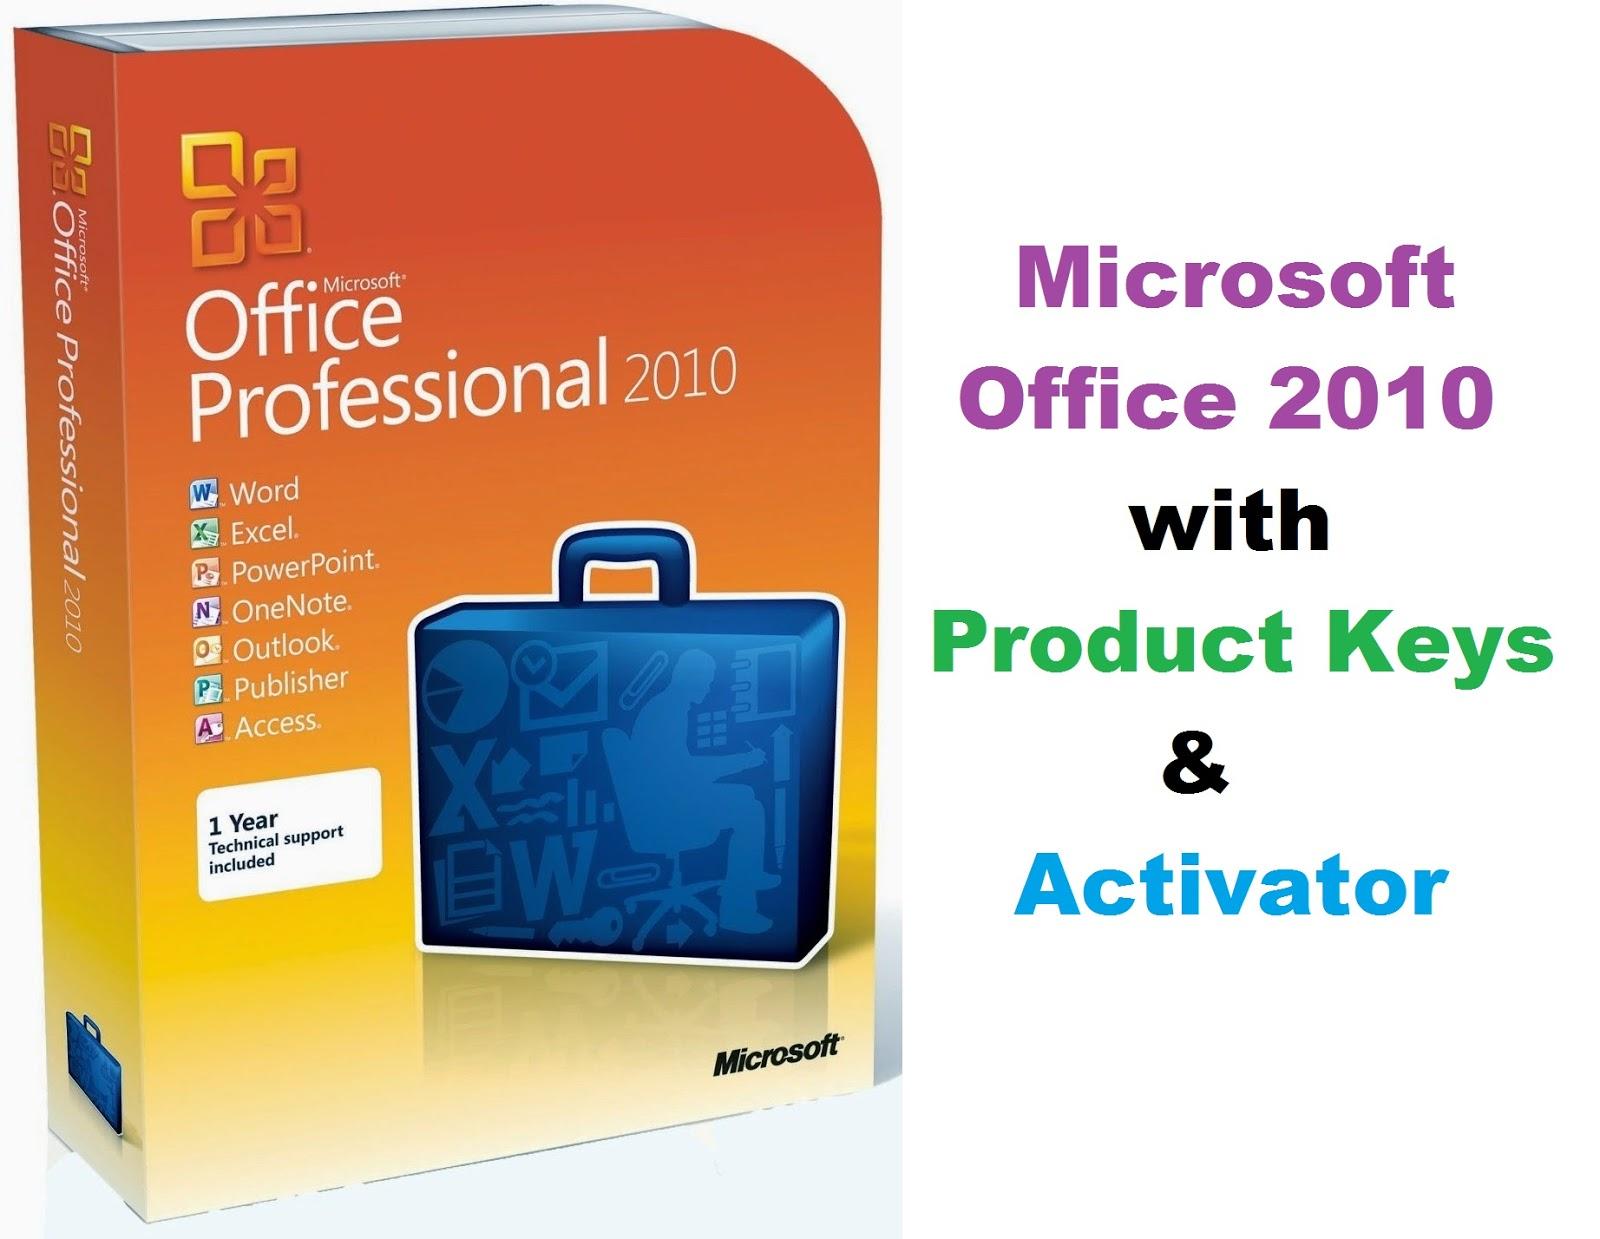 gebraucht office 2010 professional plus